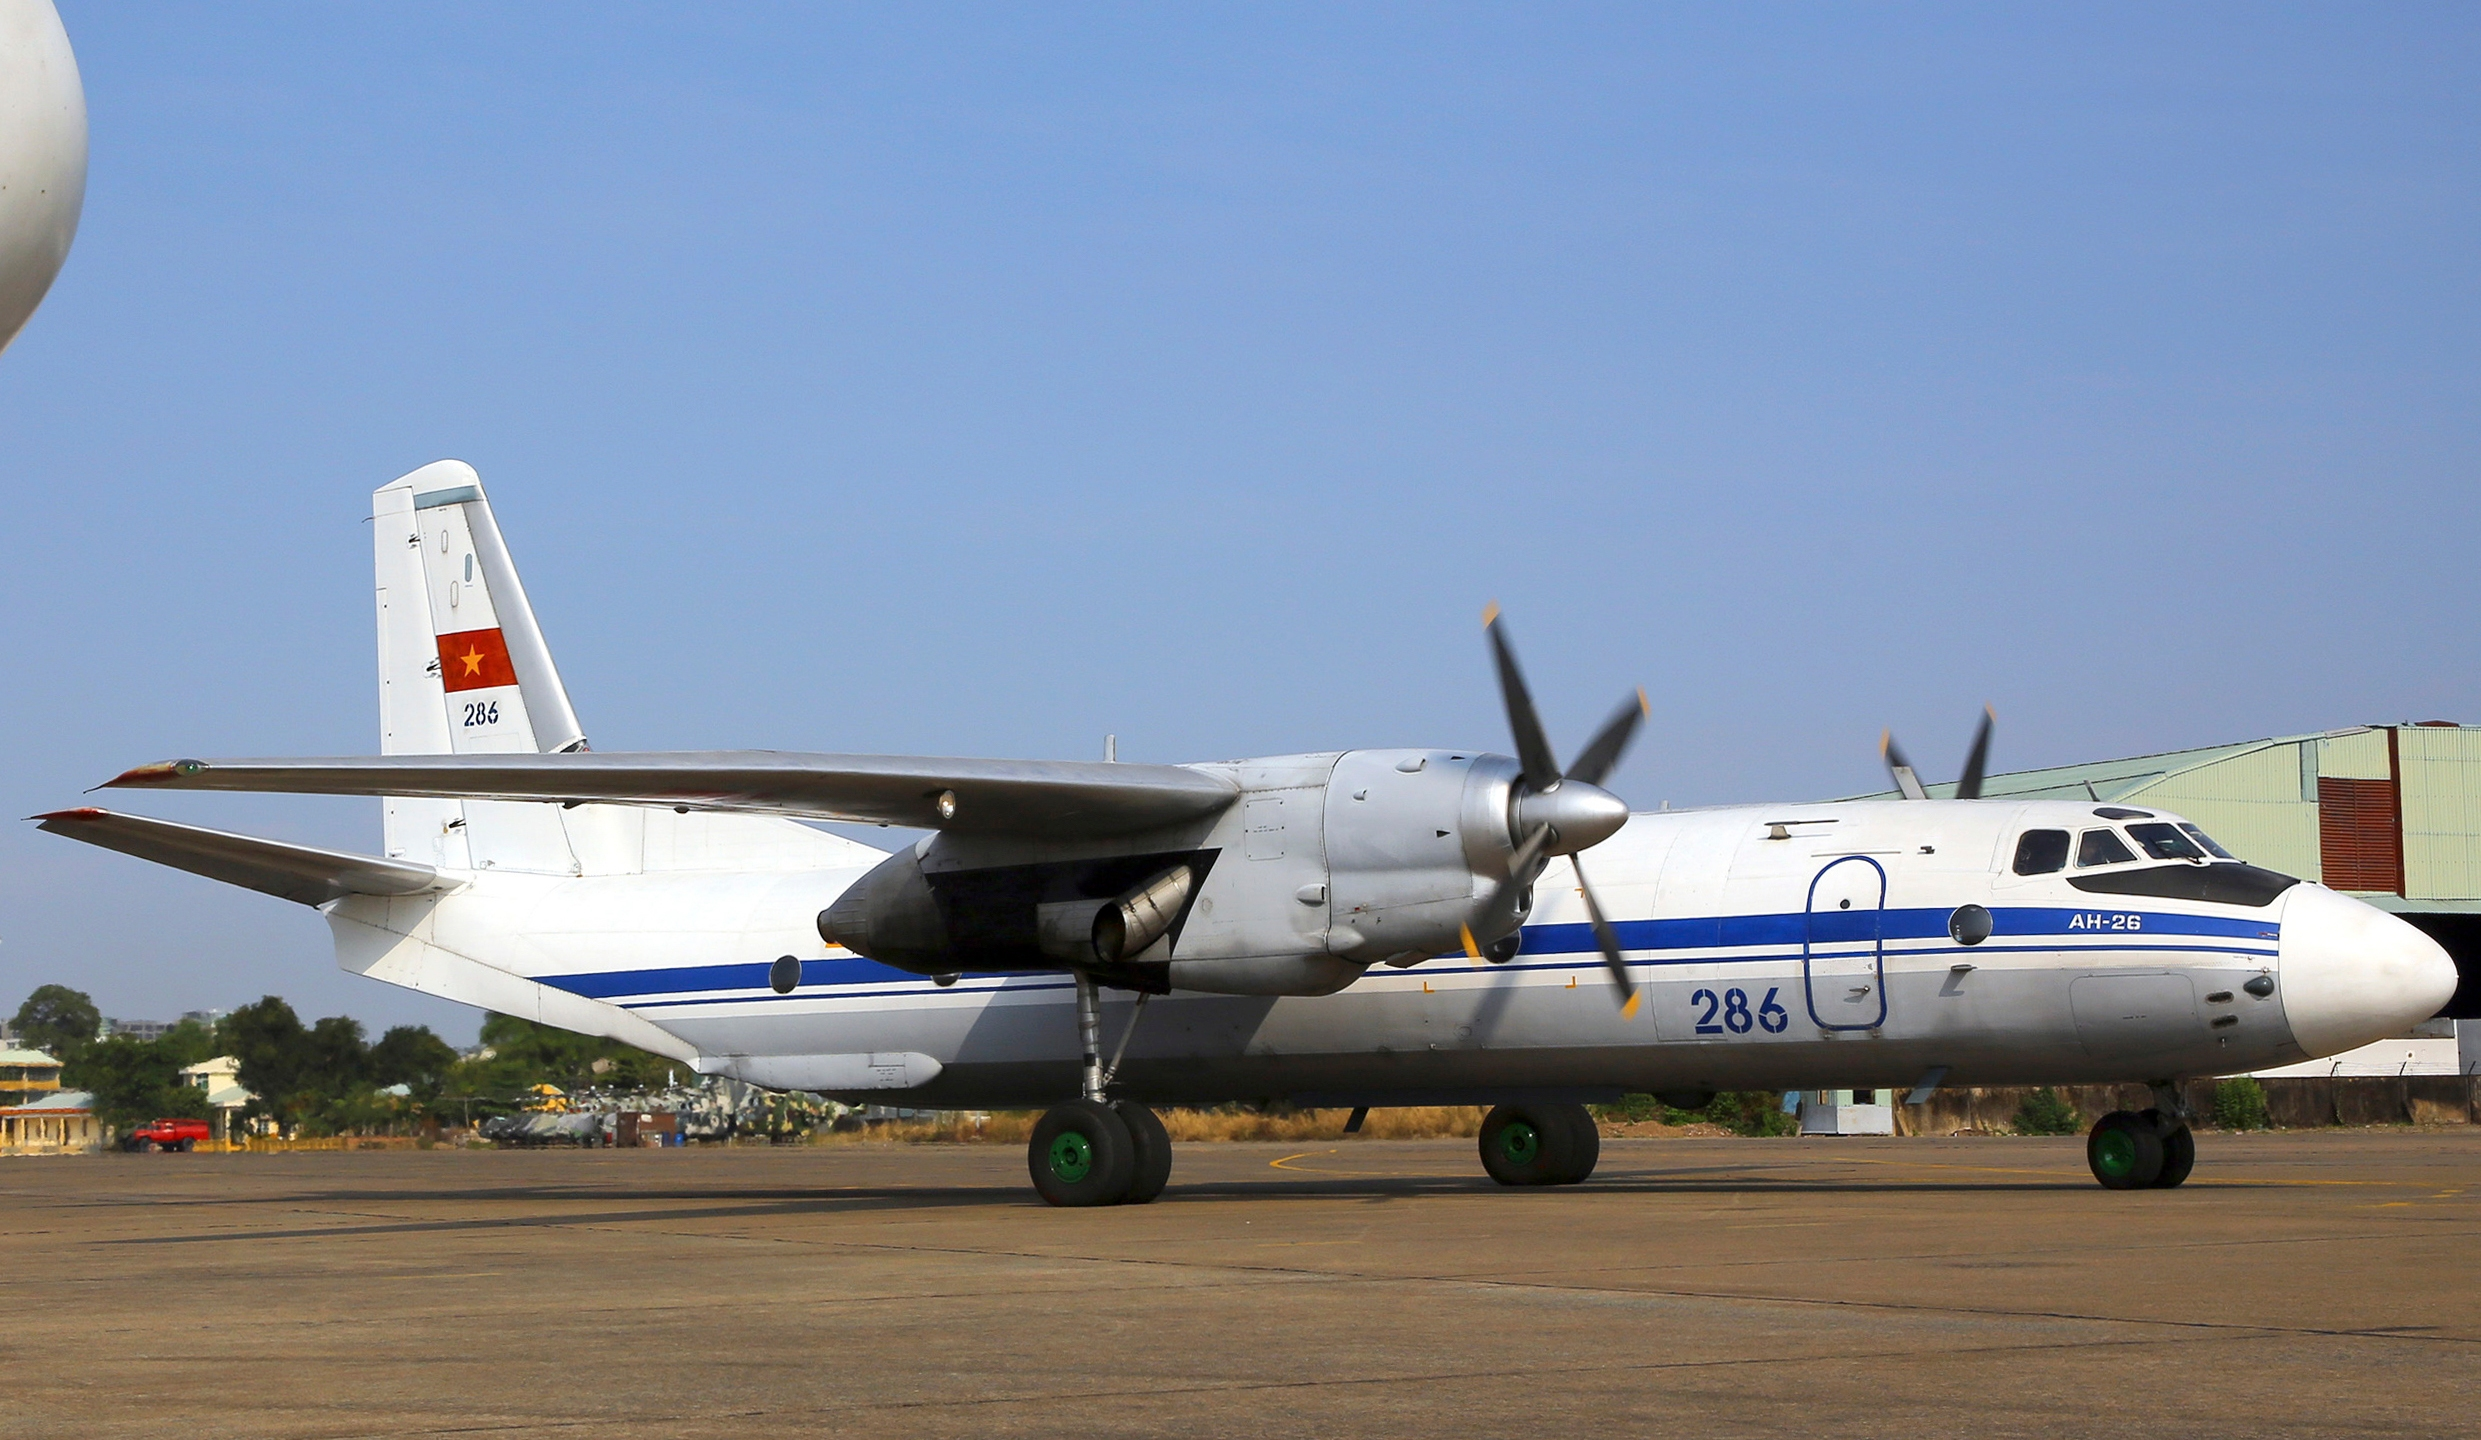 Russia Syria Plane Crash_1520357755981